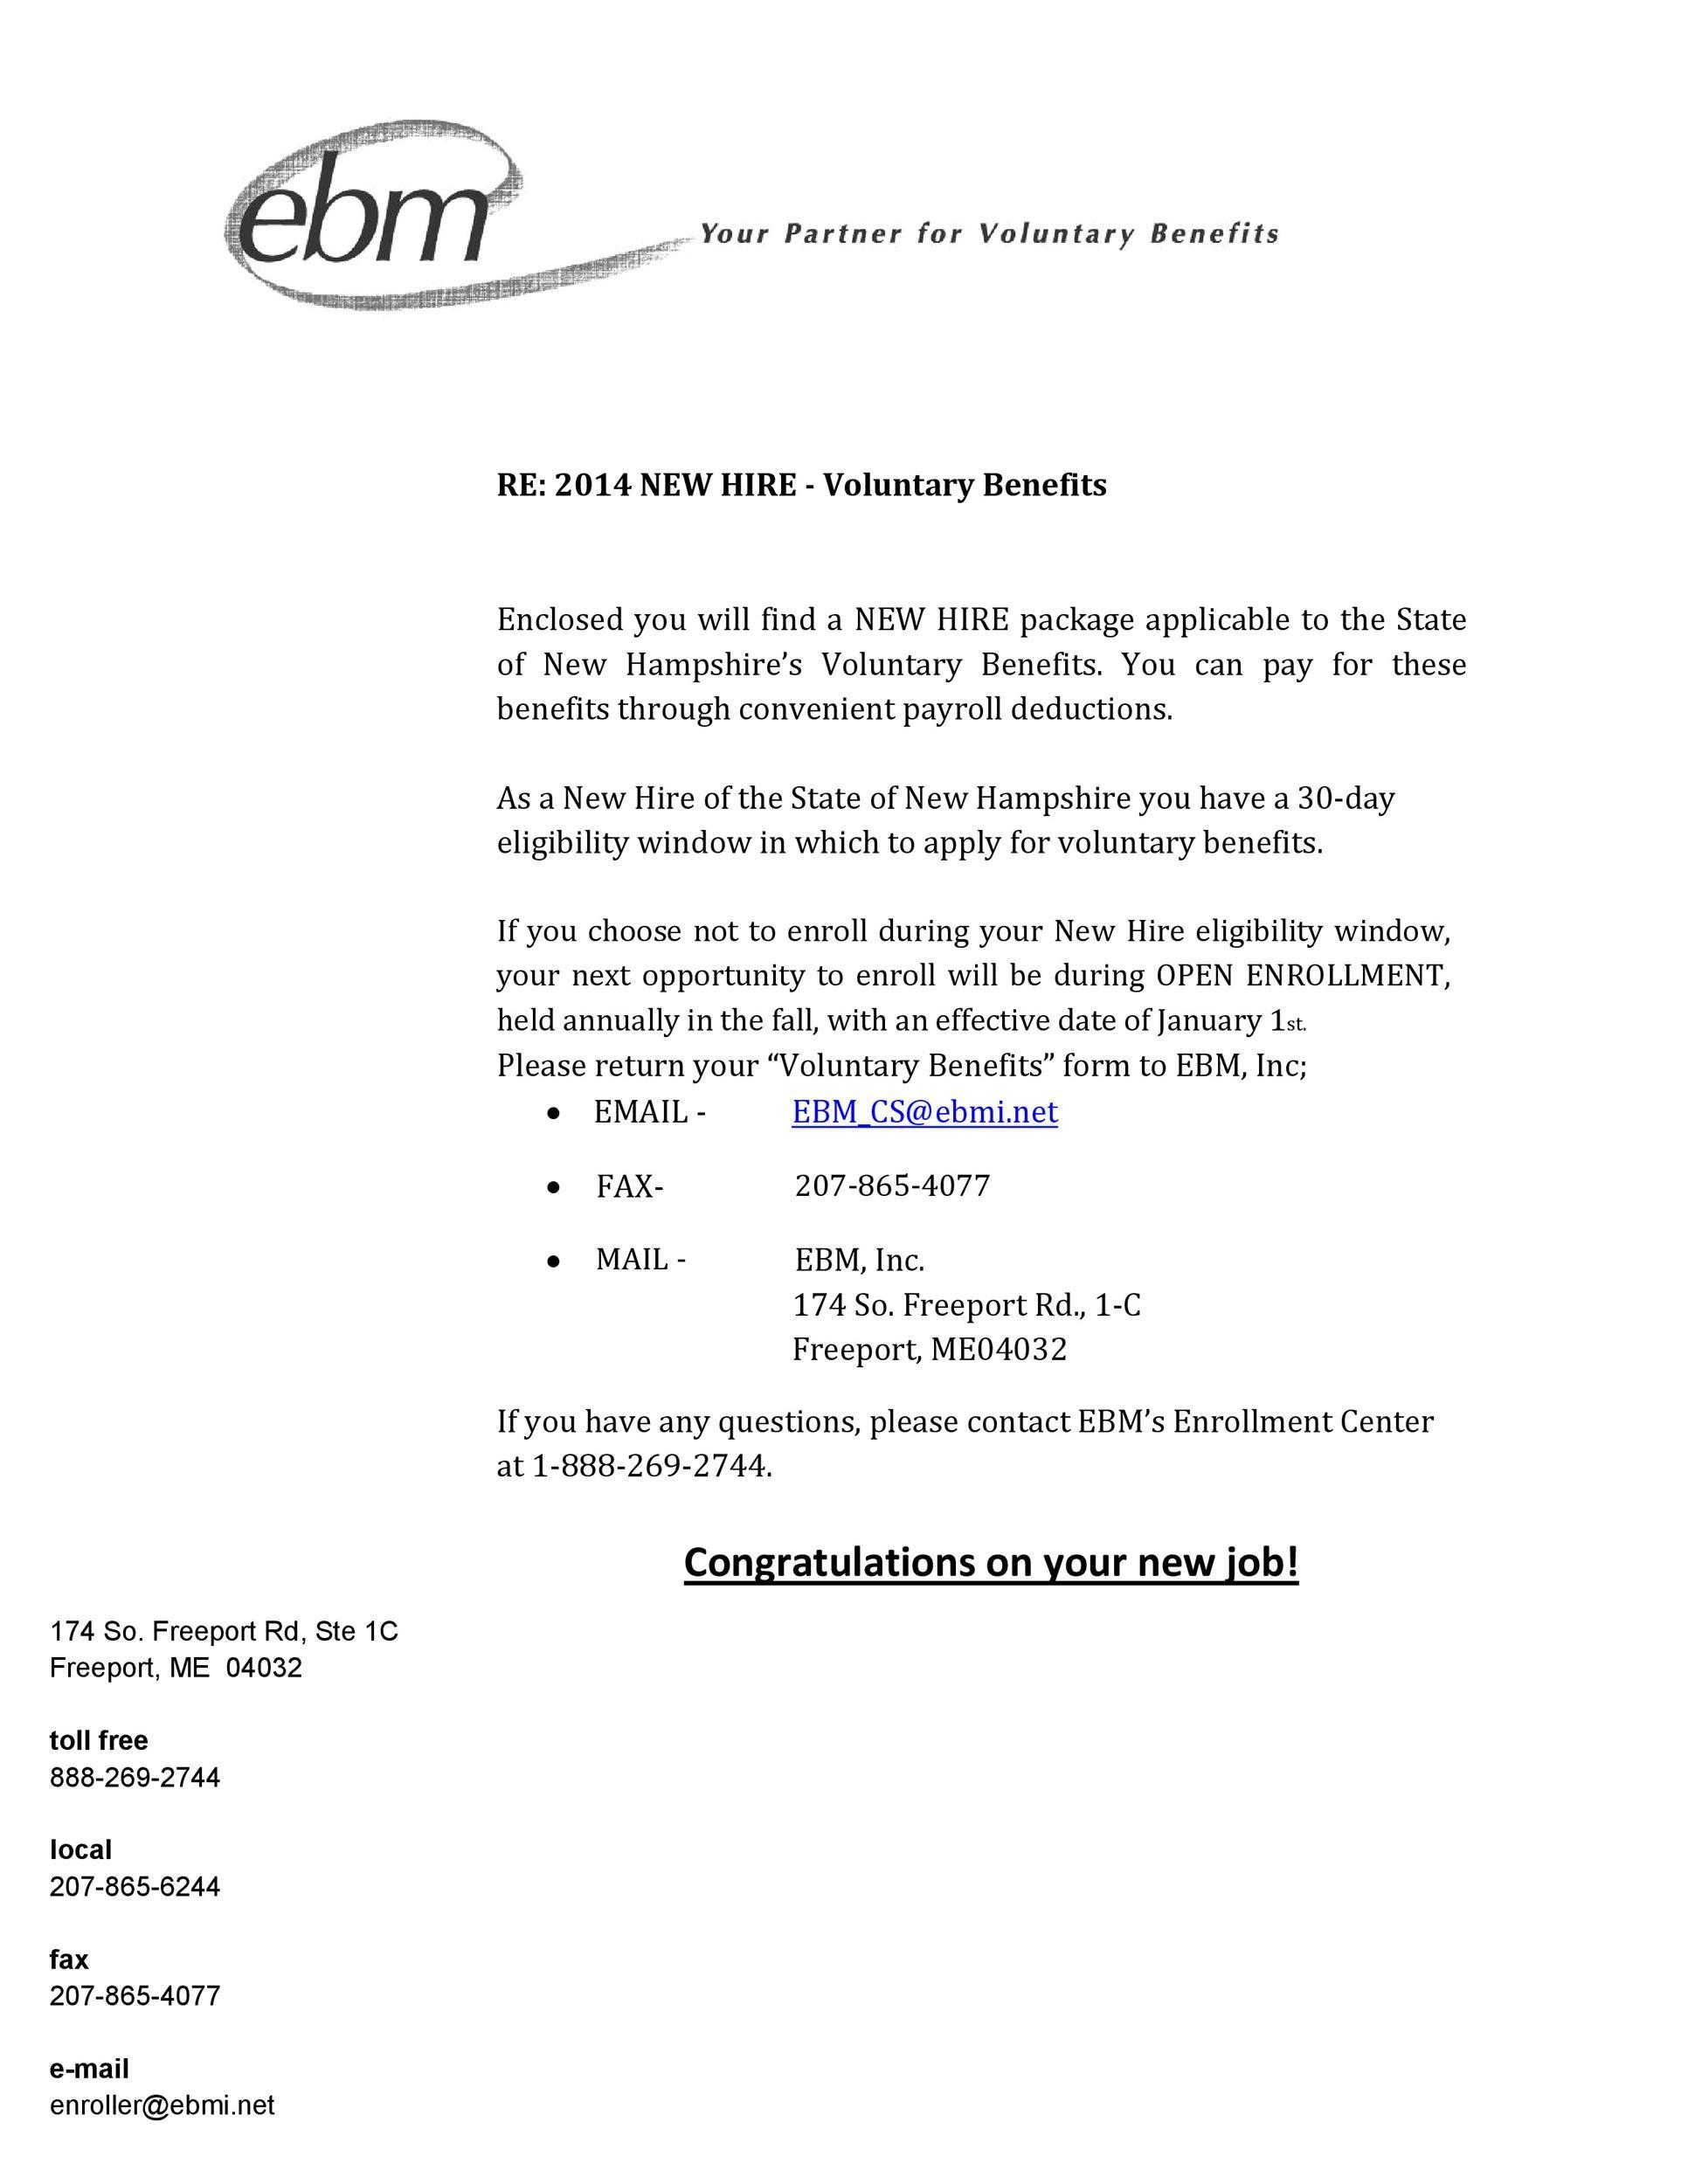 Free congratulations letter 16